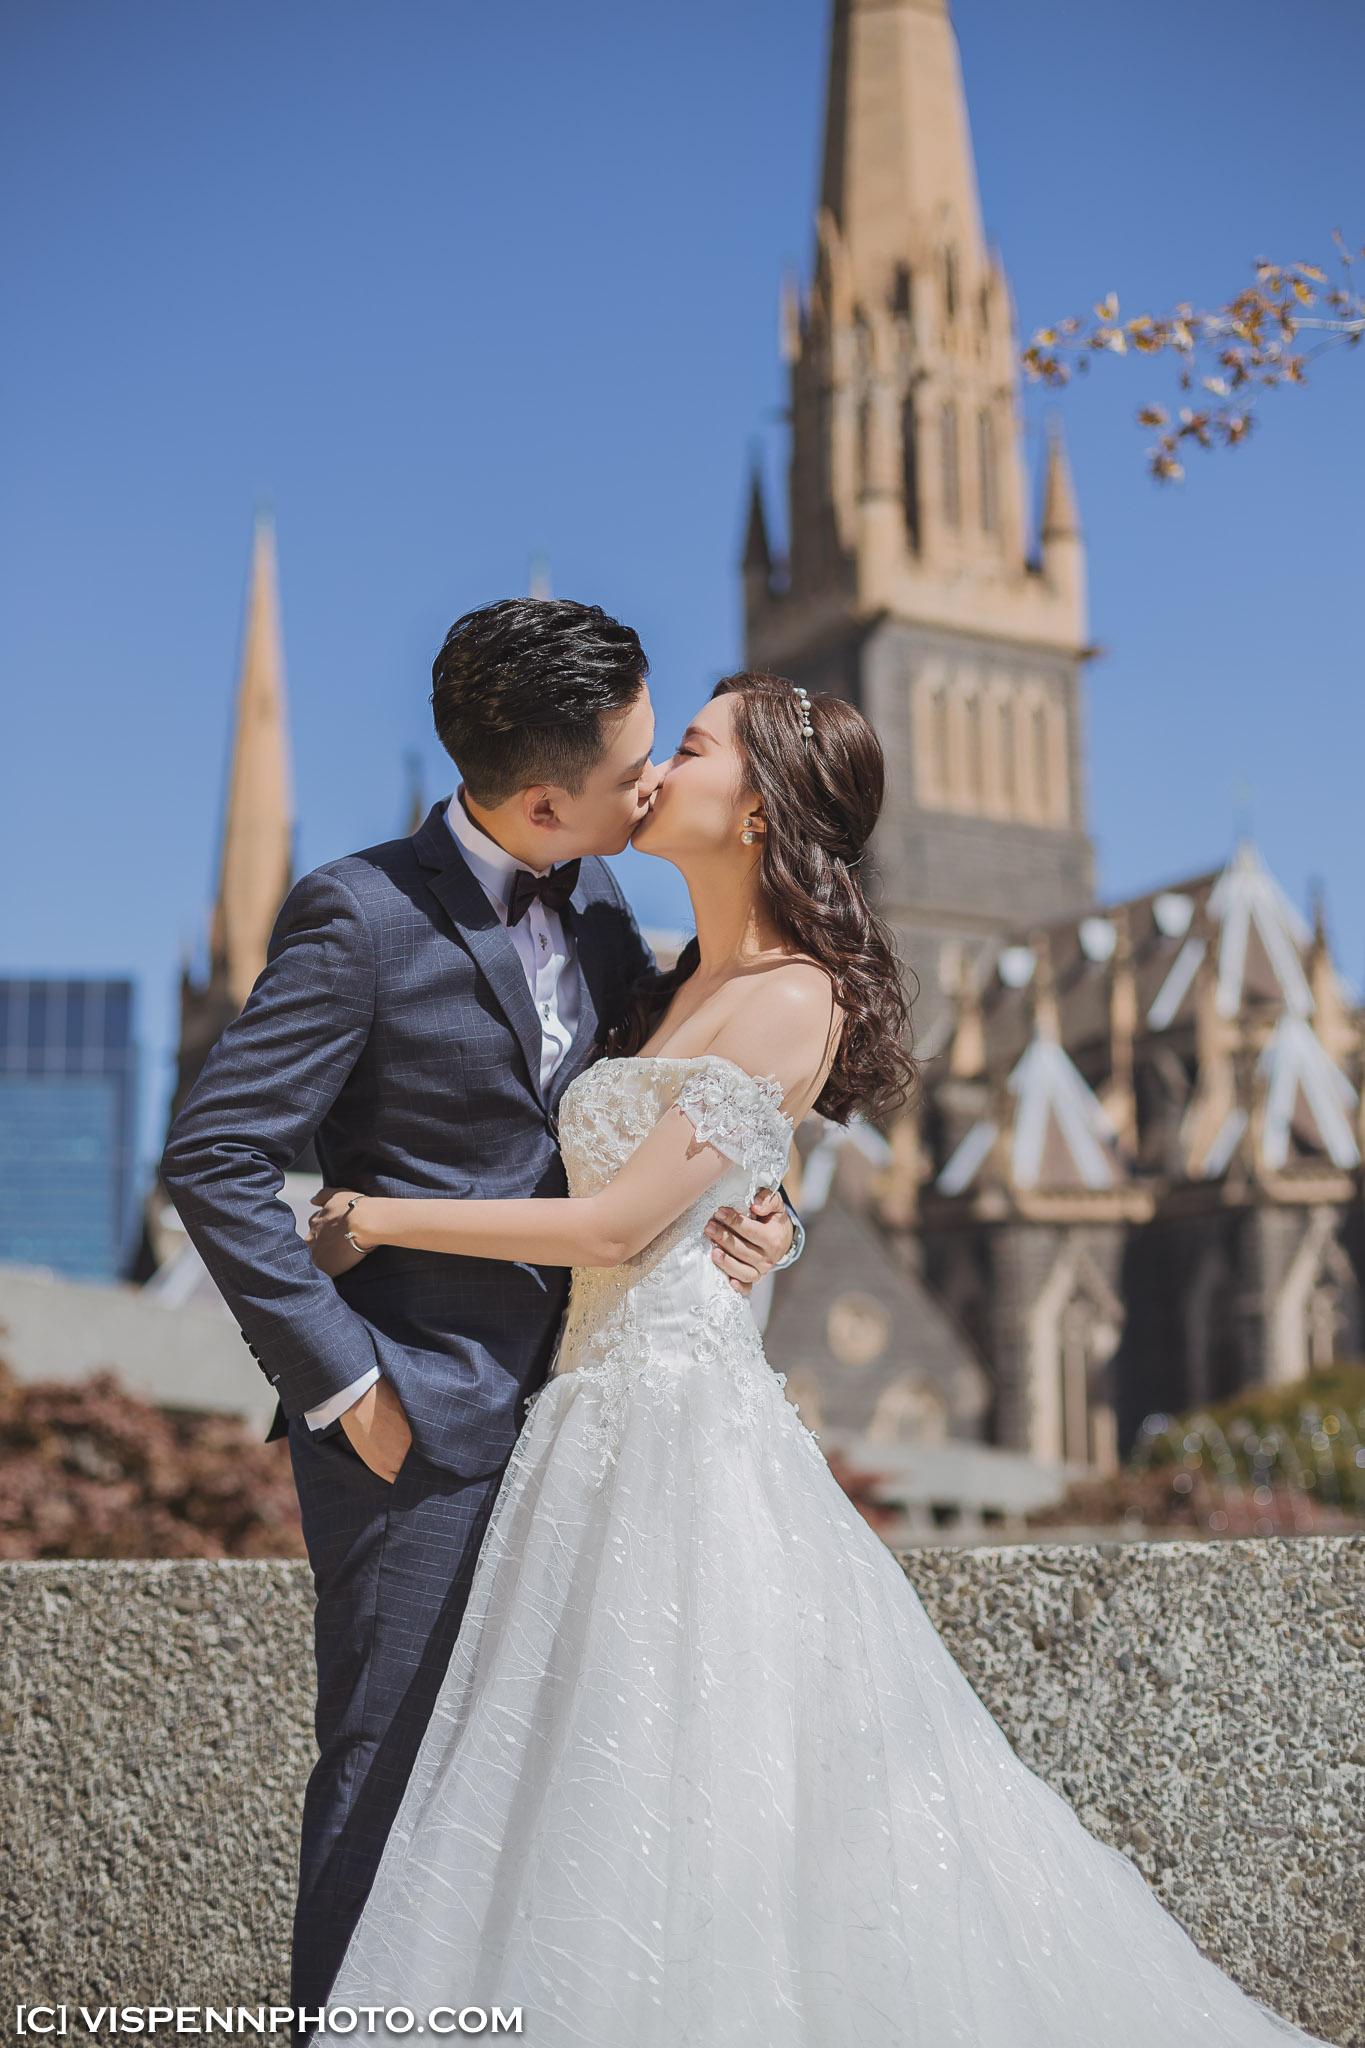 PRE WEDDING Photography Melbourne VISPENN 墨尔本 婚纱照 结婚照 婚纱摄影 AndyCHEN 0235 1DX VISPENN